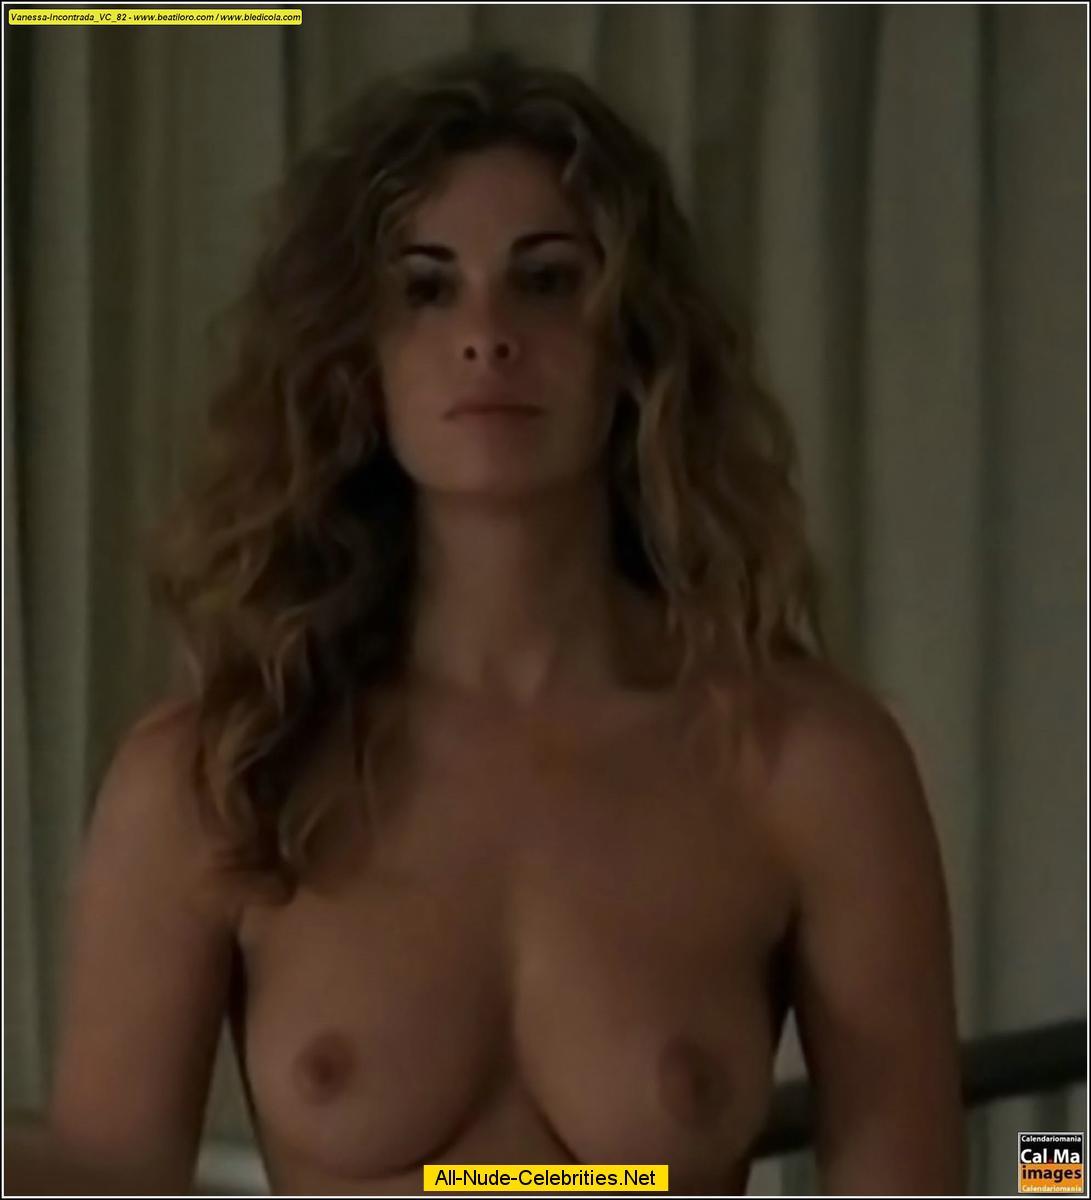 submissive cuckold pics